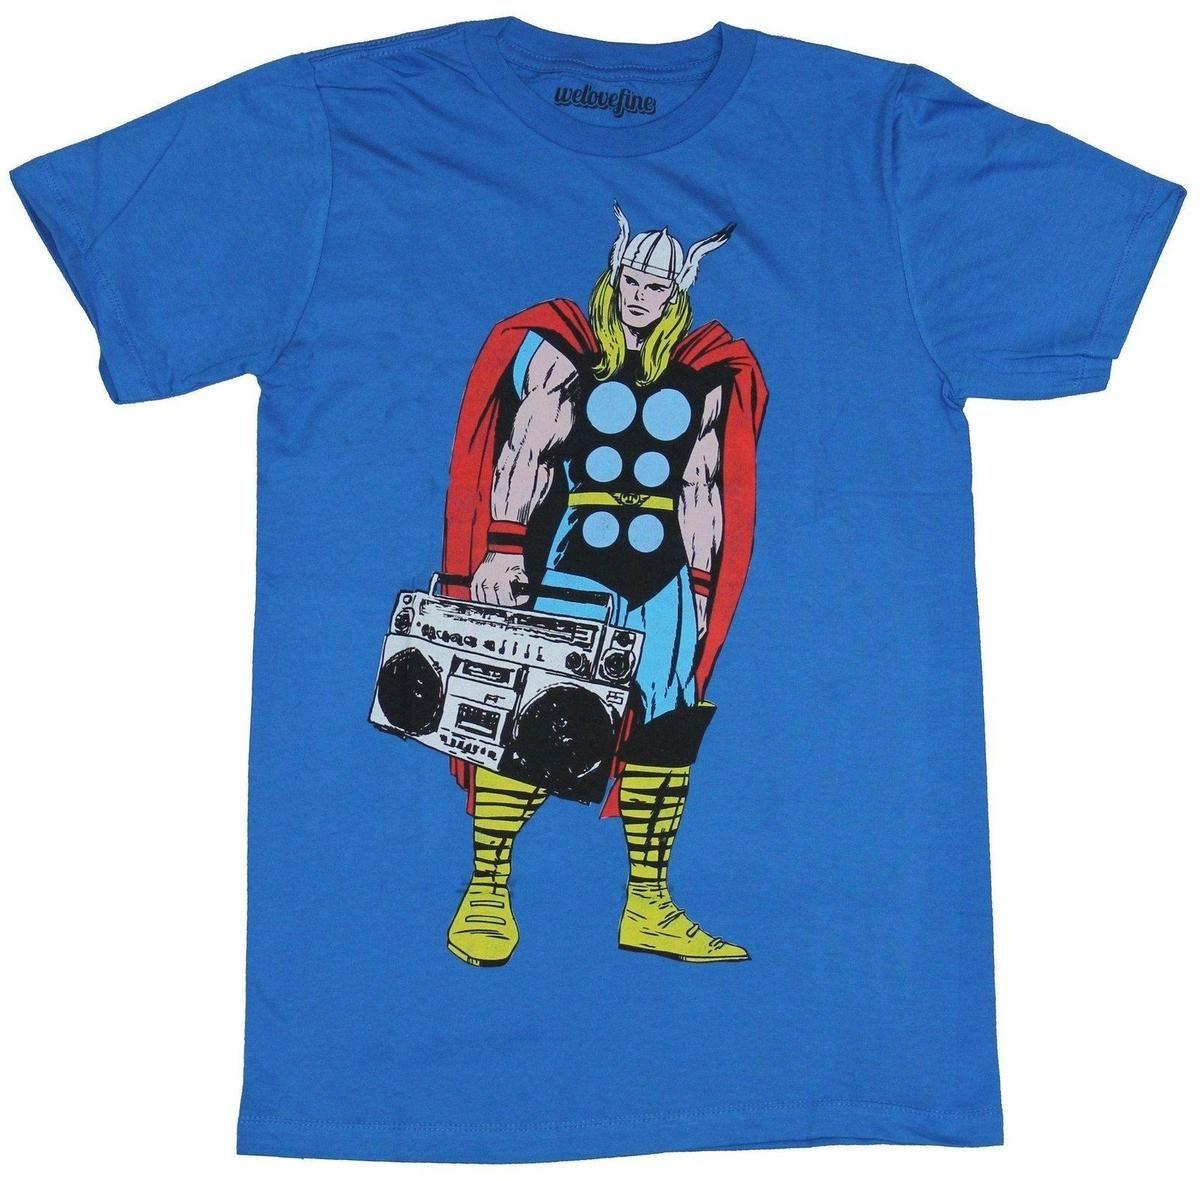 Para Top Estilo Ropa Thormarvel De Hombre Imagen ComicsCamiseta Marca Camisetas Boombox Fitness Toting A Impreso Verano WbHIEDY2e9